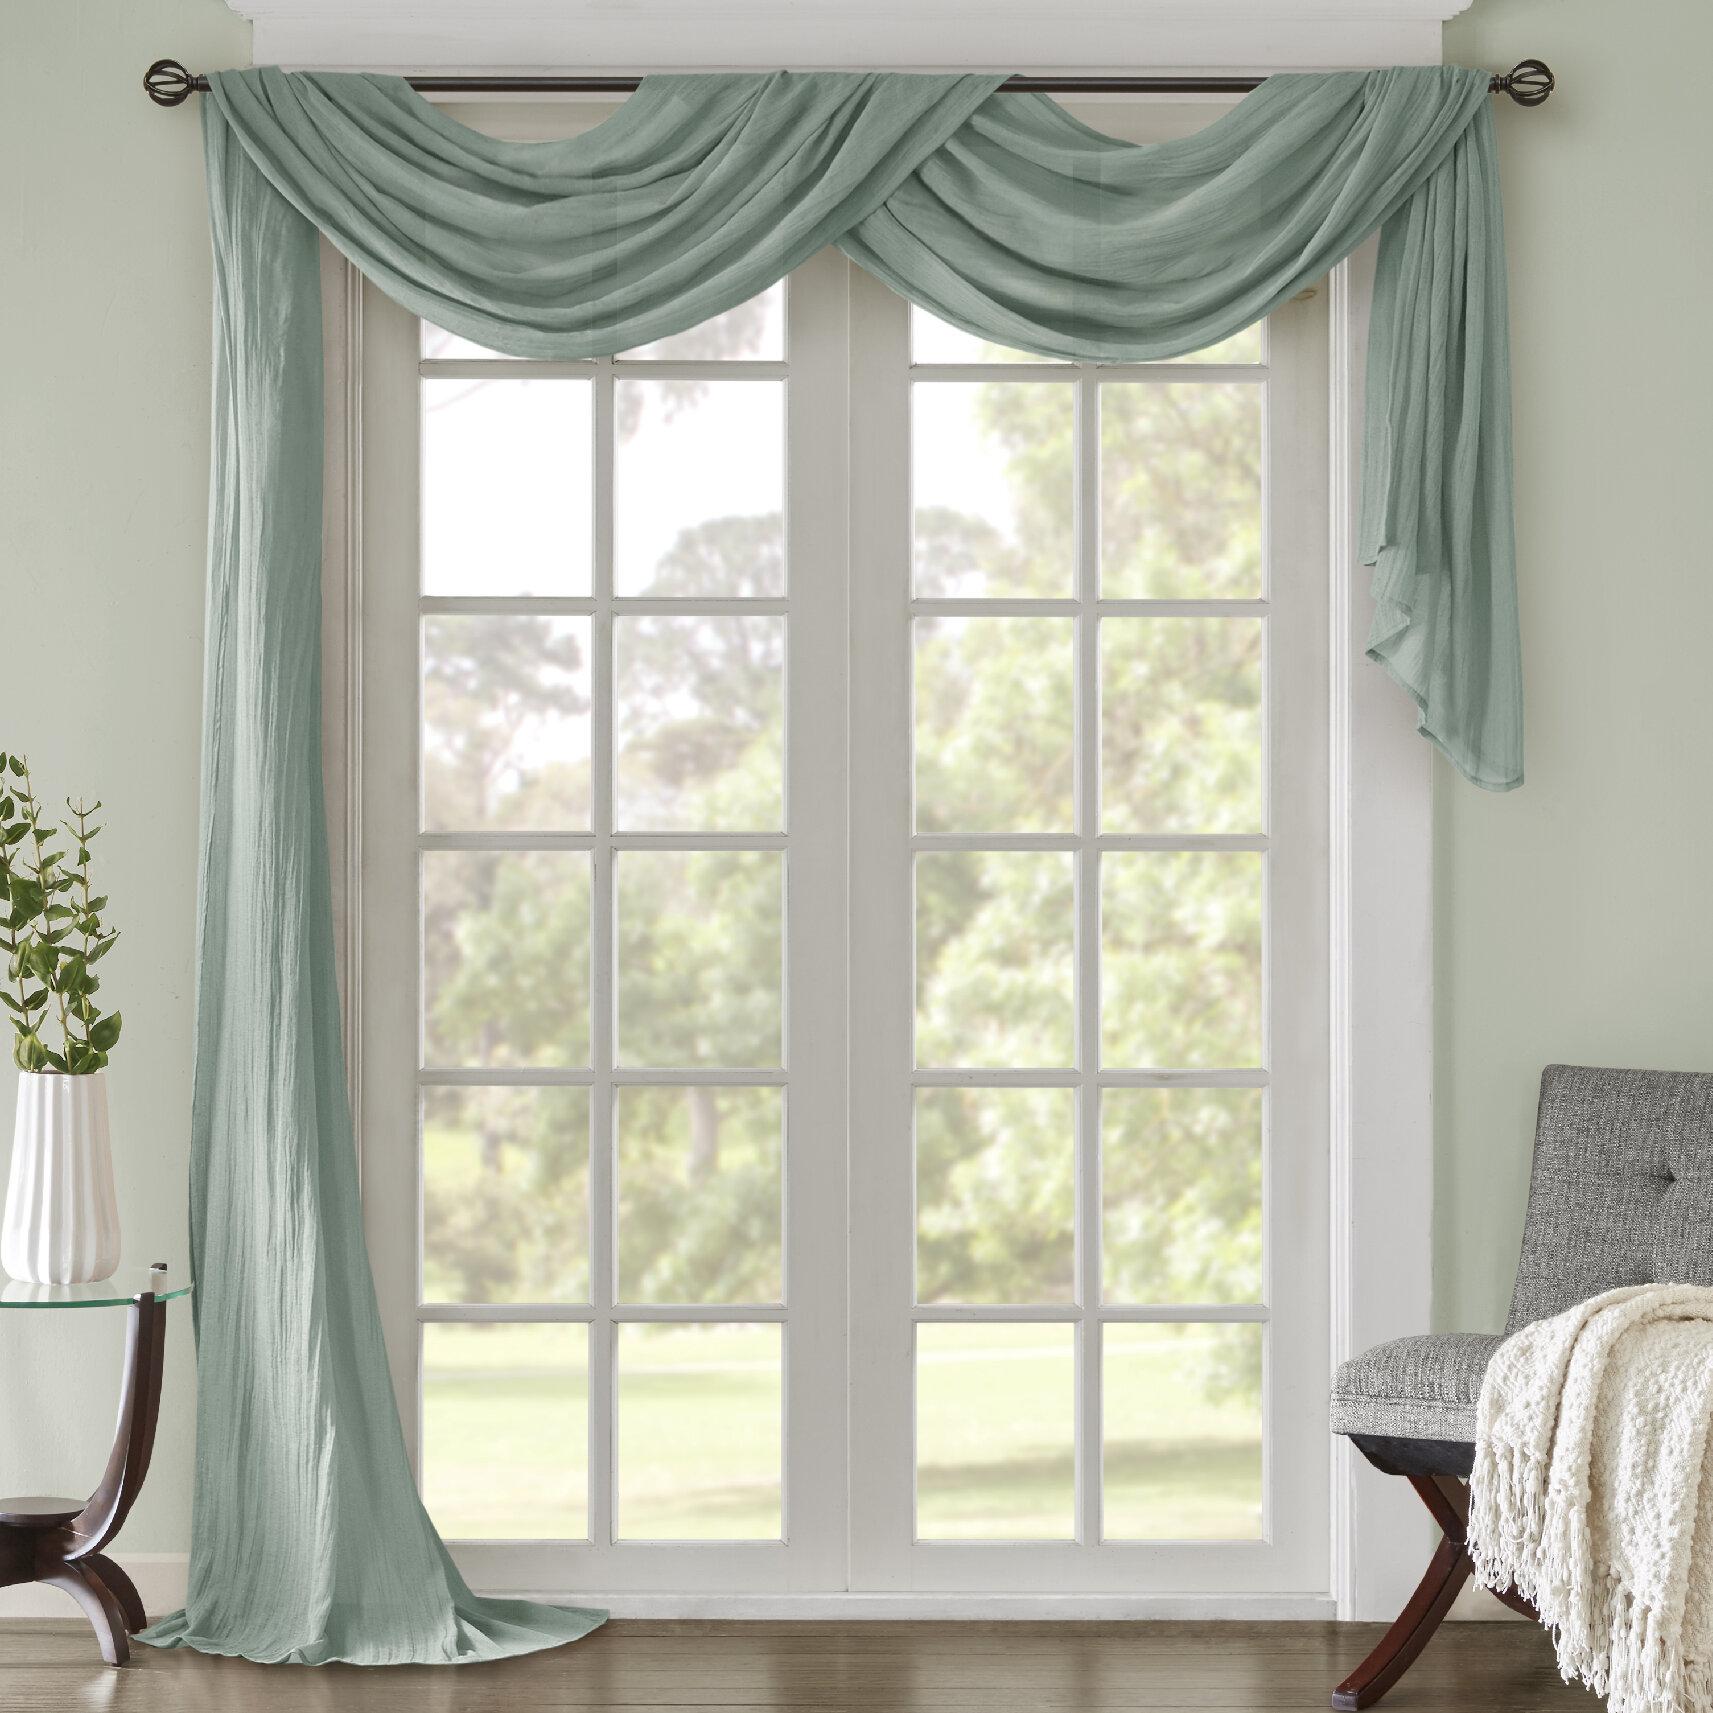 Sheer Curtains You'll Love in 2019 | Wayfair